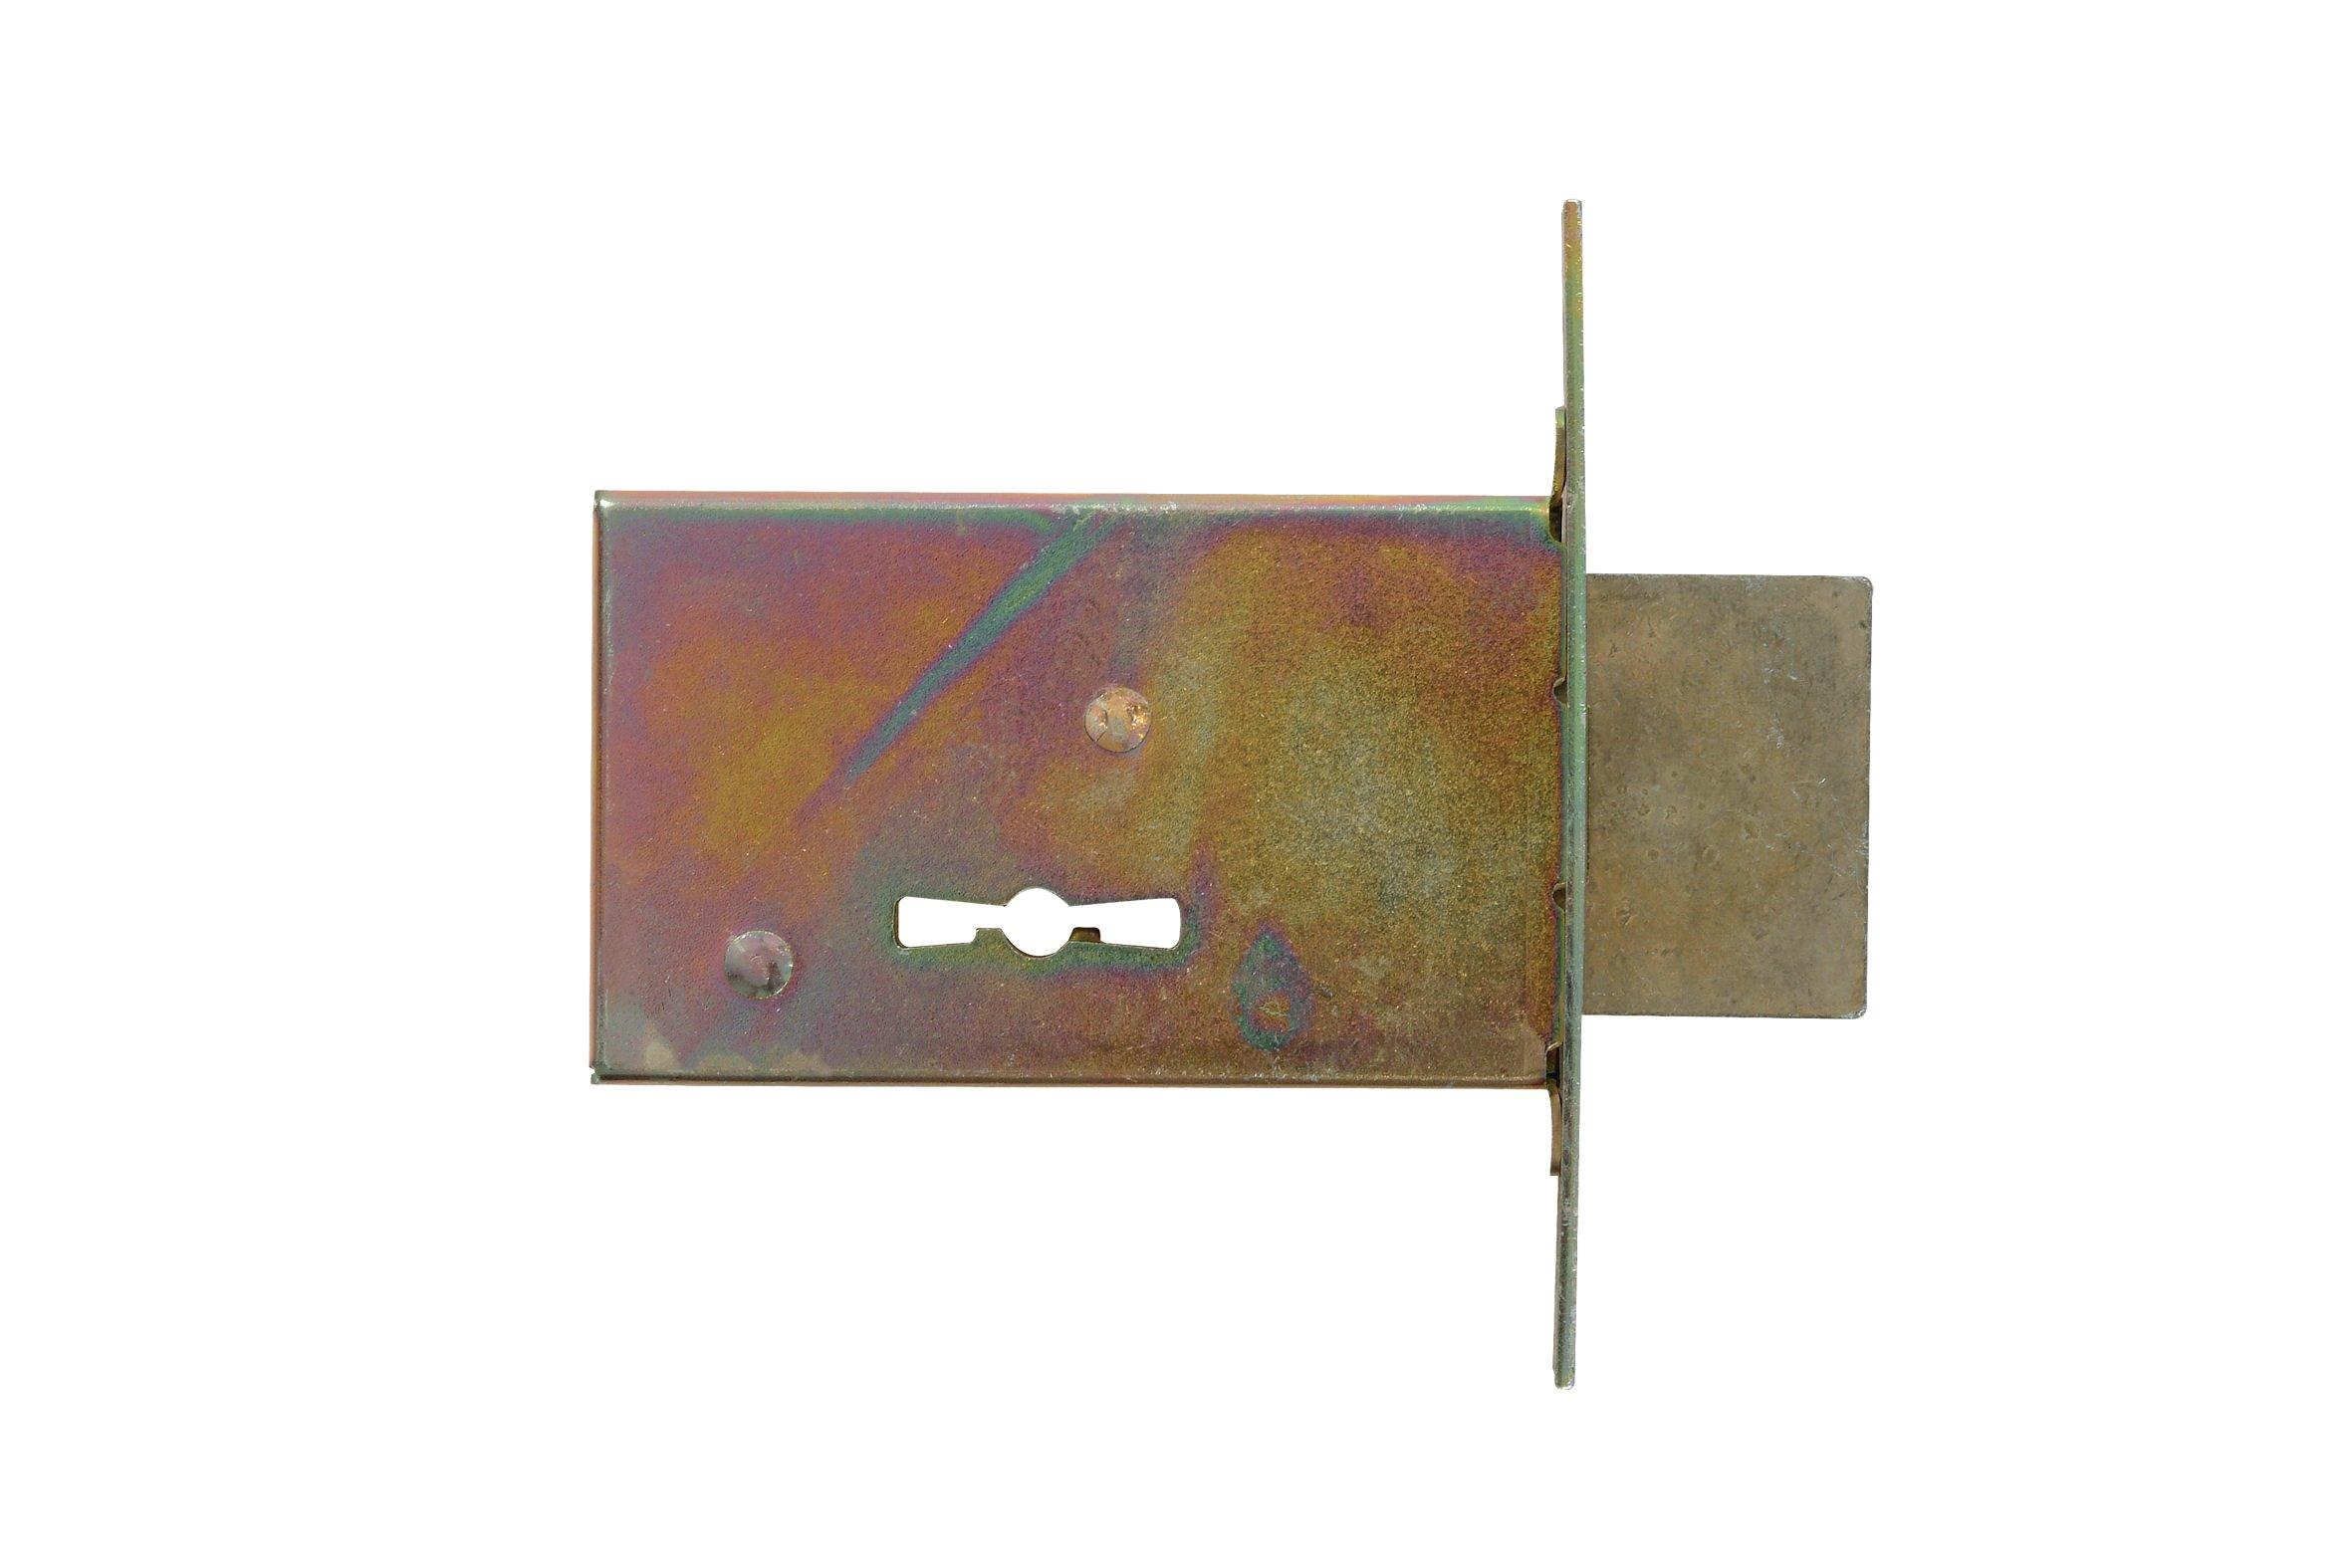 5 Lever Security Gate Lock